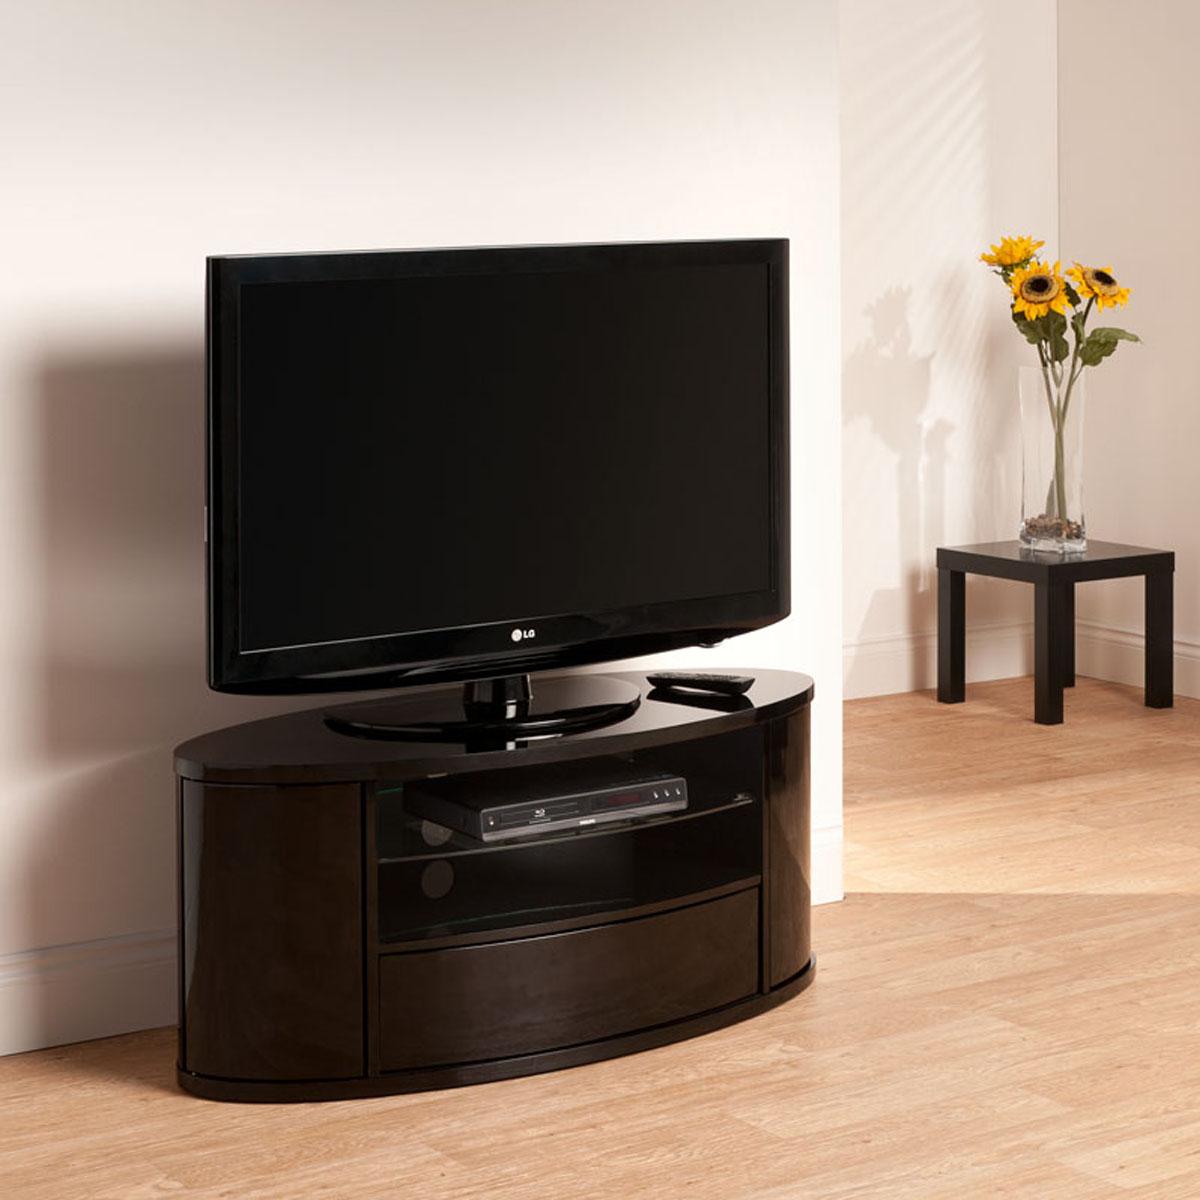 curved design black lcd plasma tv stand 40 50 inch screen ebay. Black Bedroom Furniture Sets. Home Design Ideas